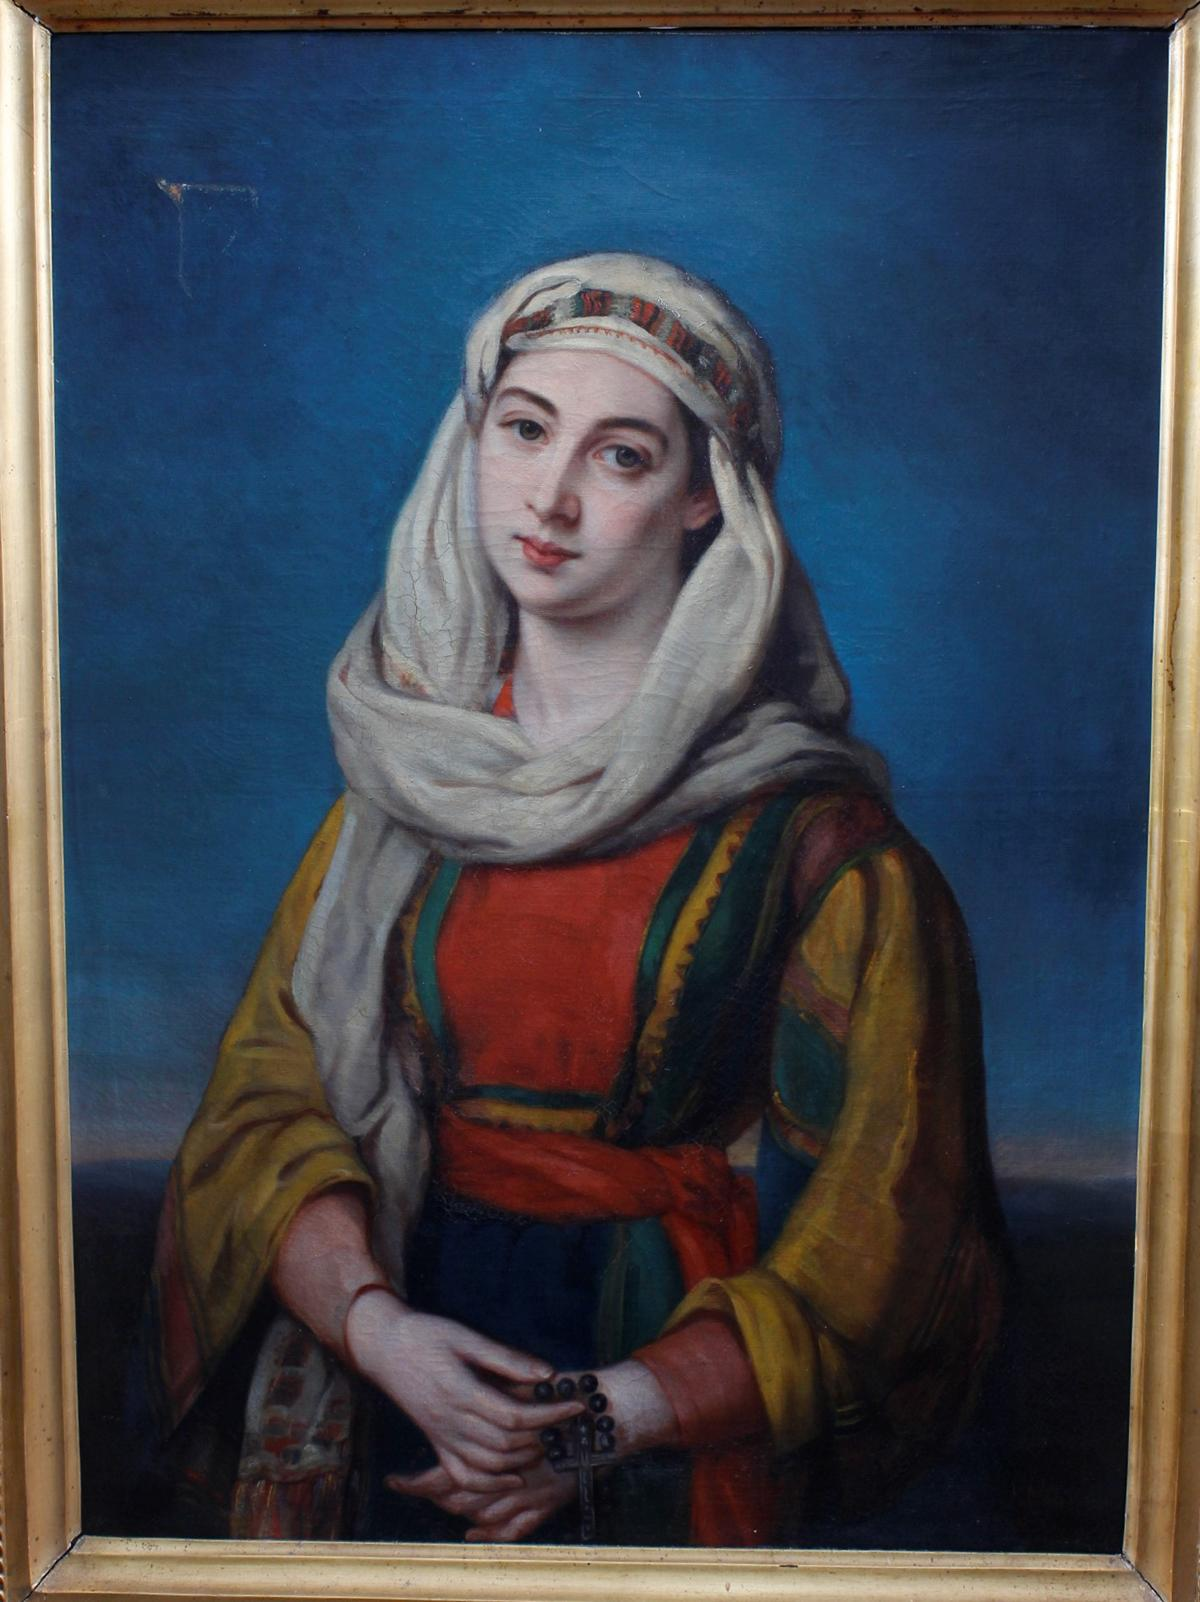 Anonymer Maler aus dem 19. Jahrhundert-2